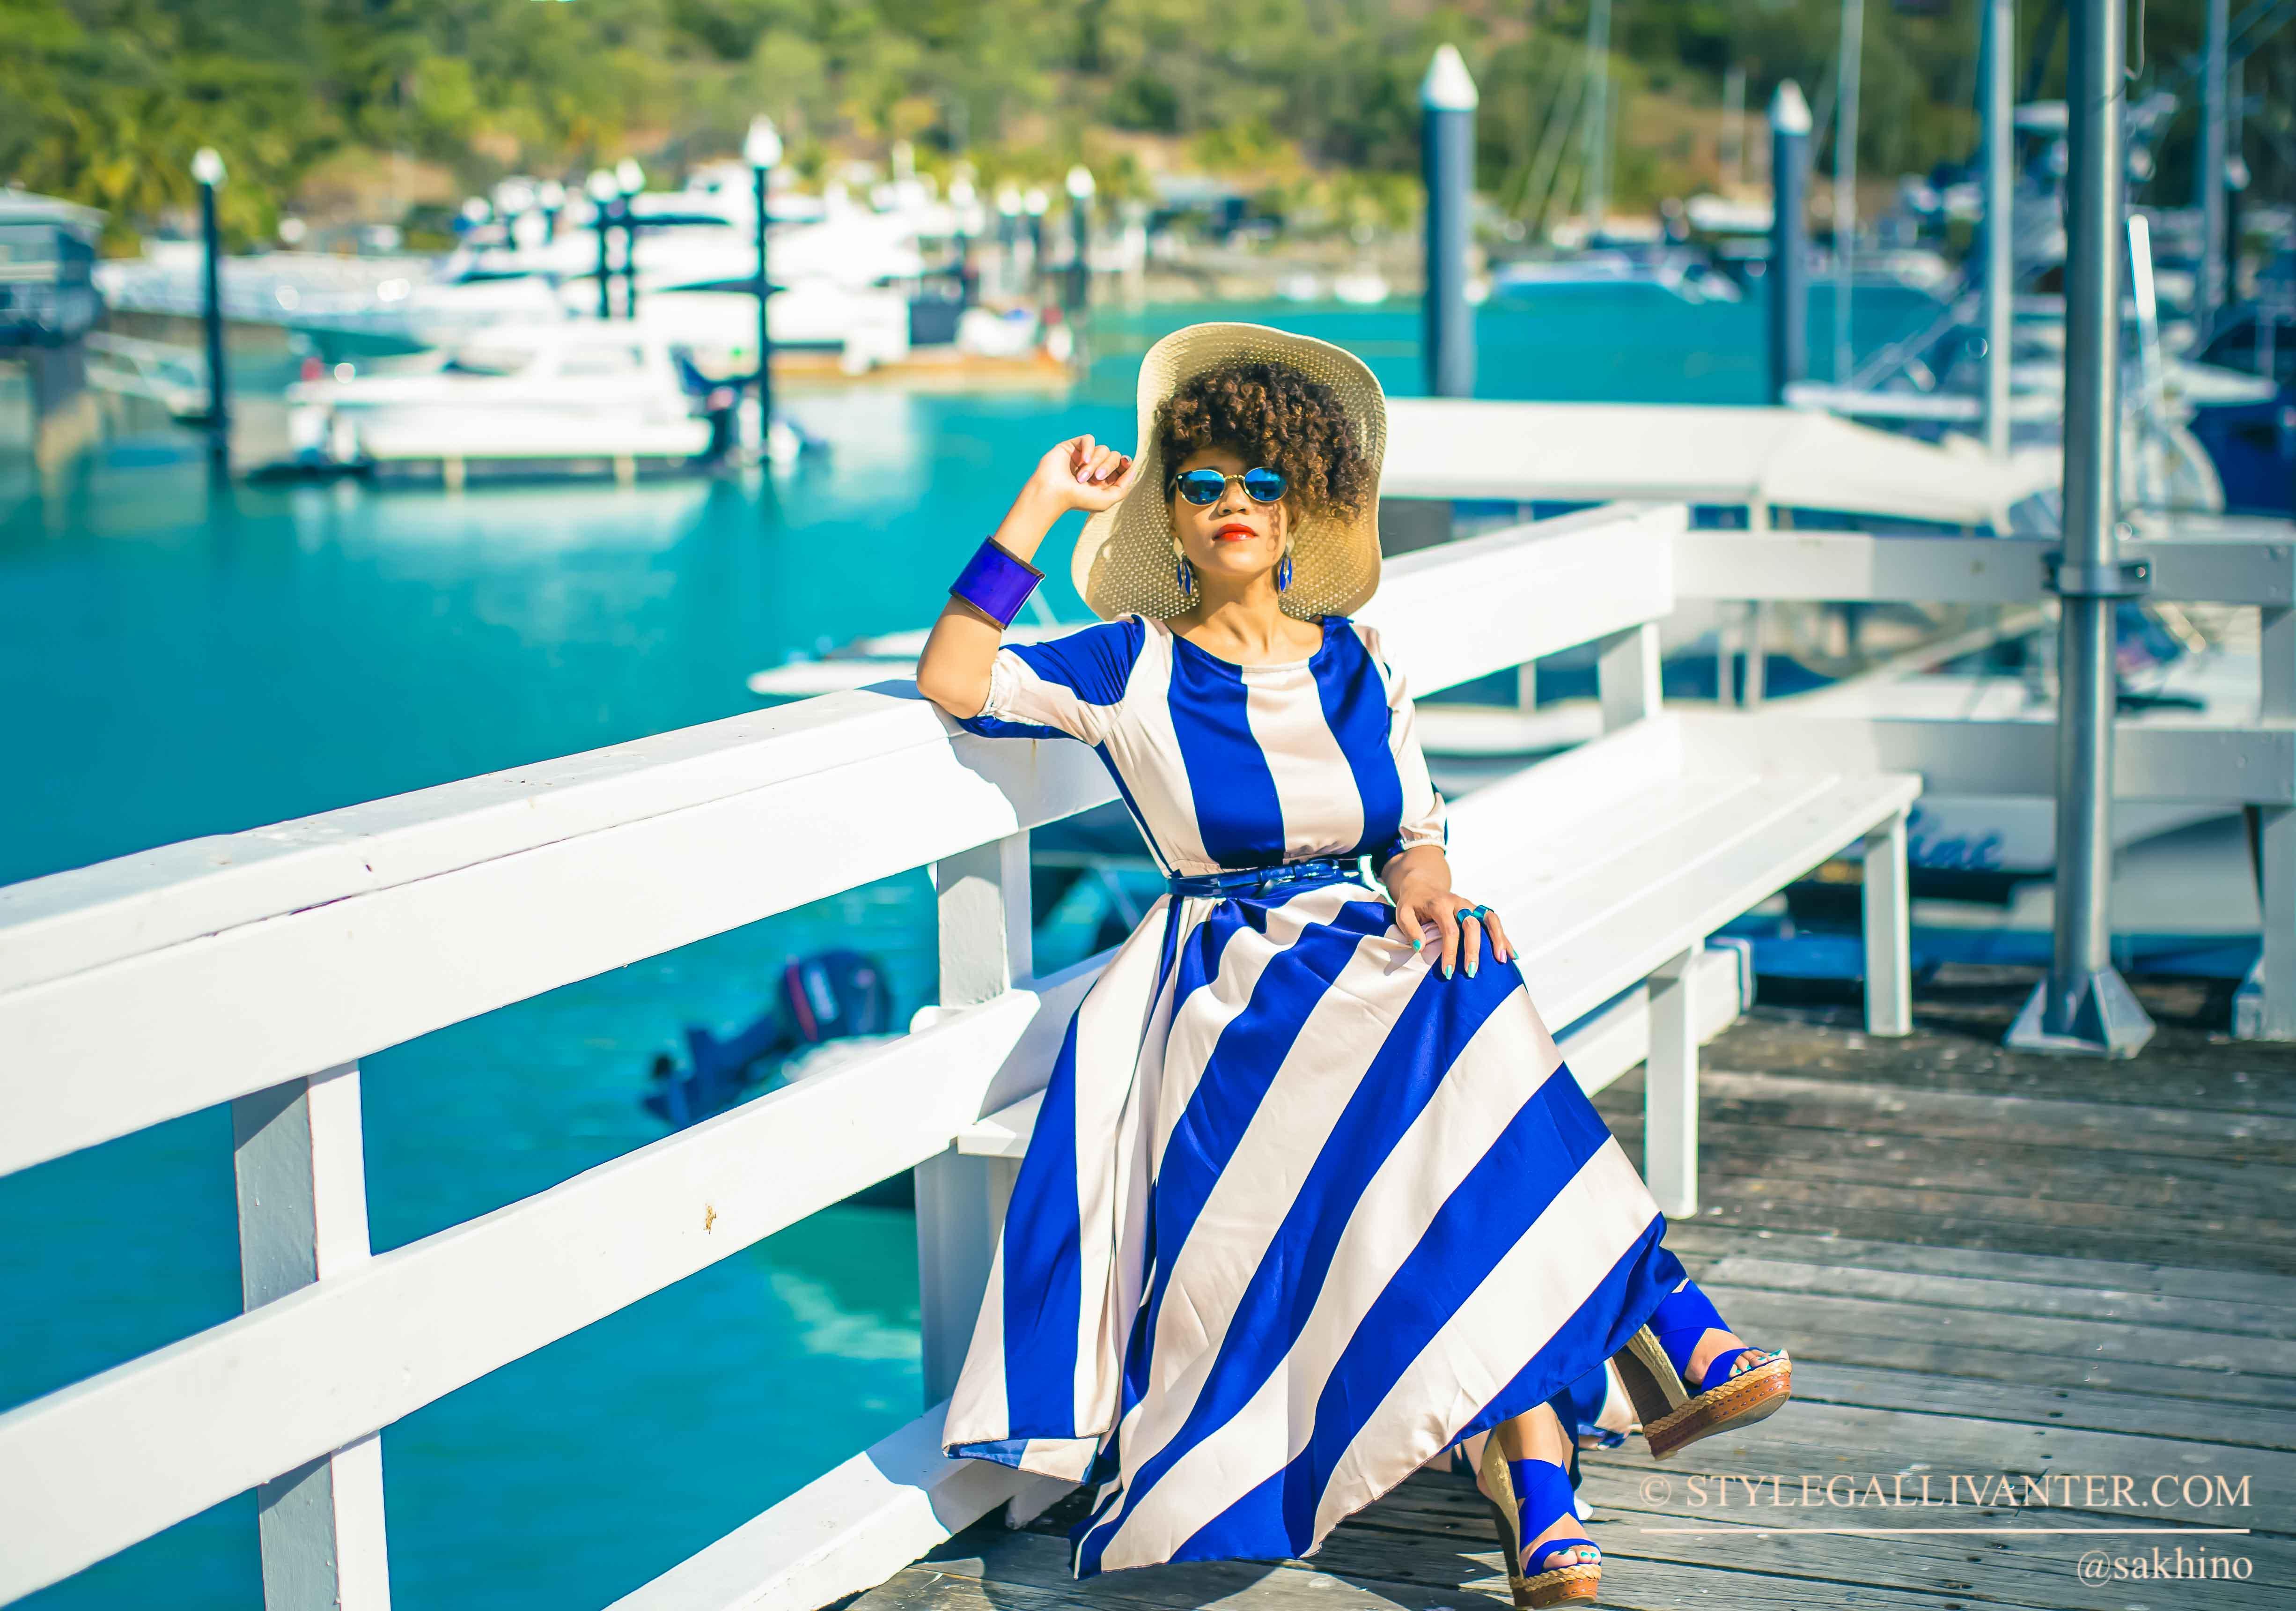 HAMILTON-ISLAND_TOP-AUSTRALIAN-DESTINATIONS_STYLEGALLIVANTER_MIRANDA-SAKHINO_sakhino_magazine-cover-december-2015_summer-2015-editorials_australia's-top-fashion-bloggers-11